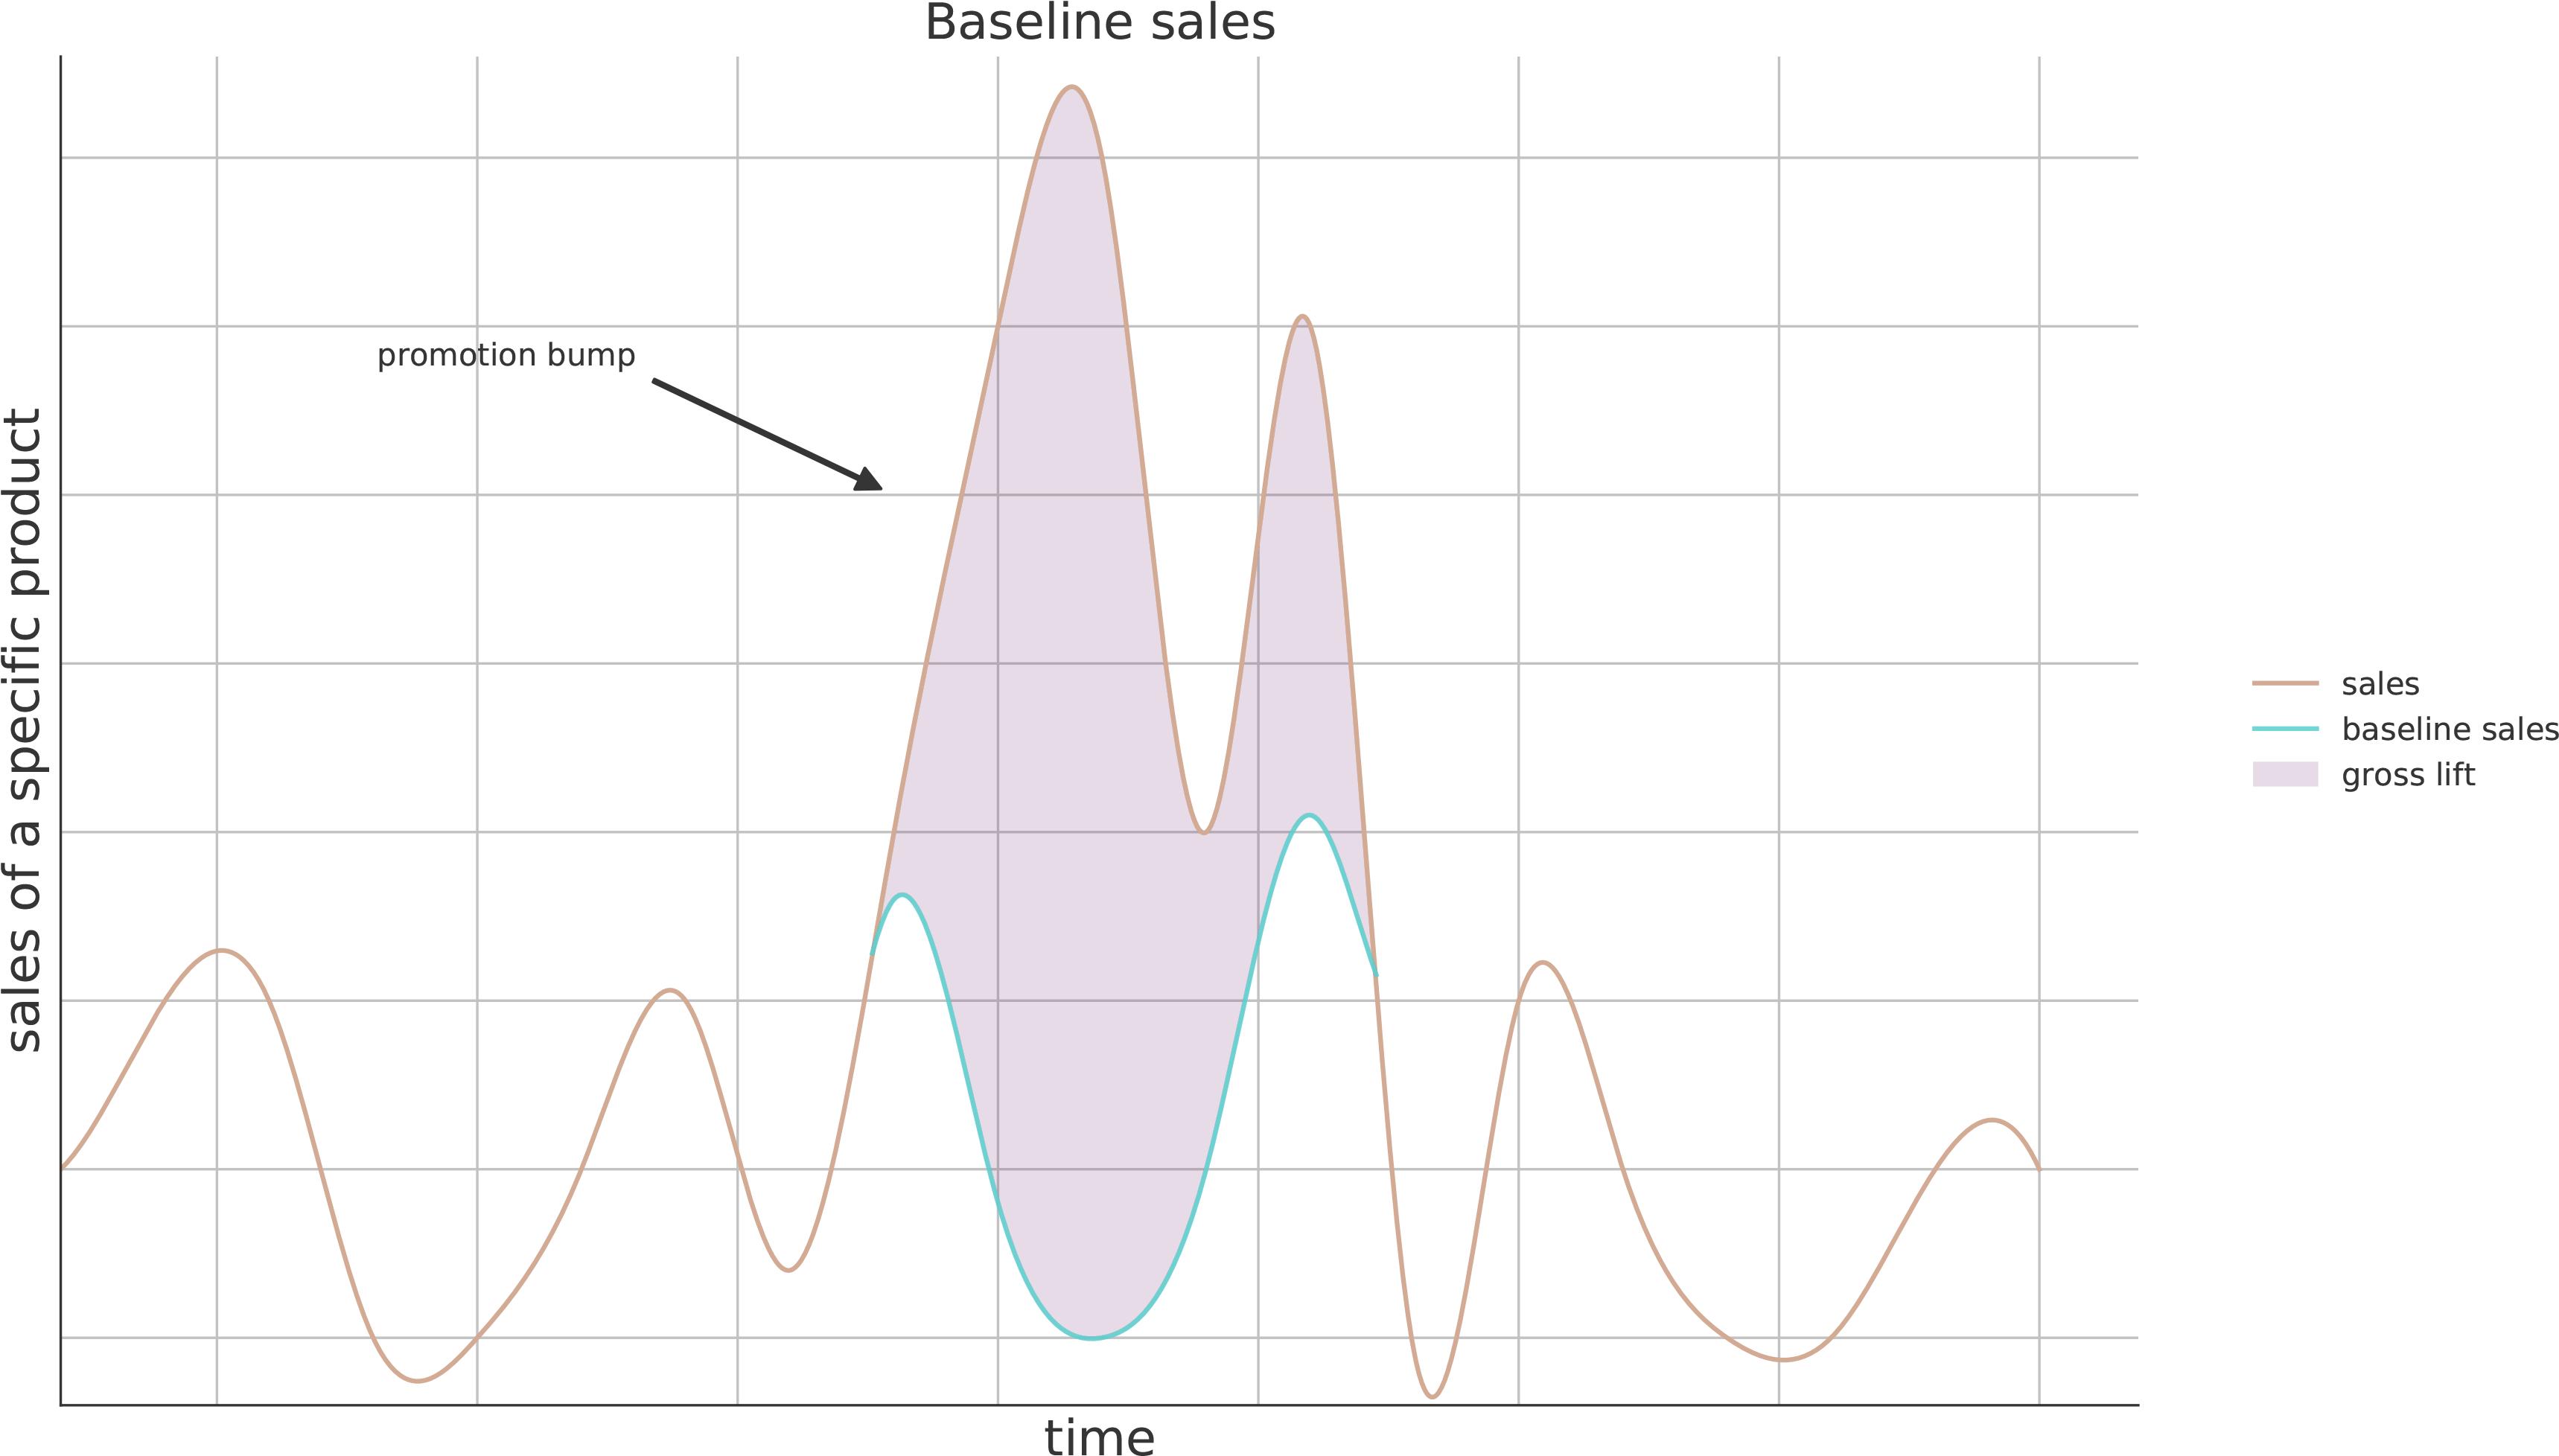 baseline sales